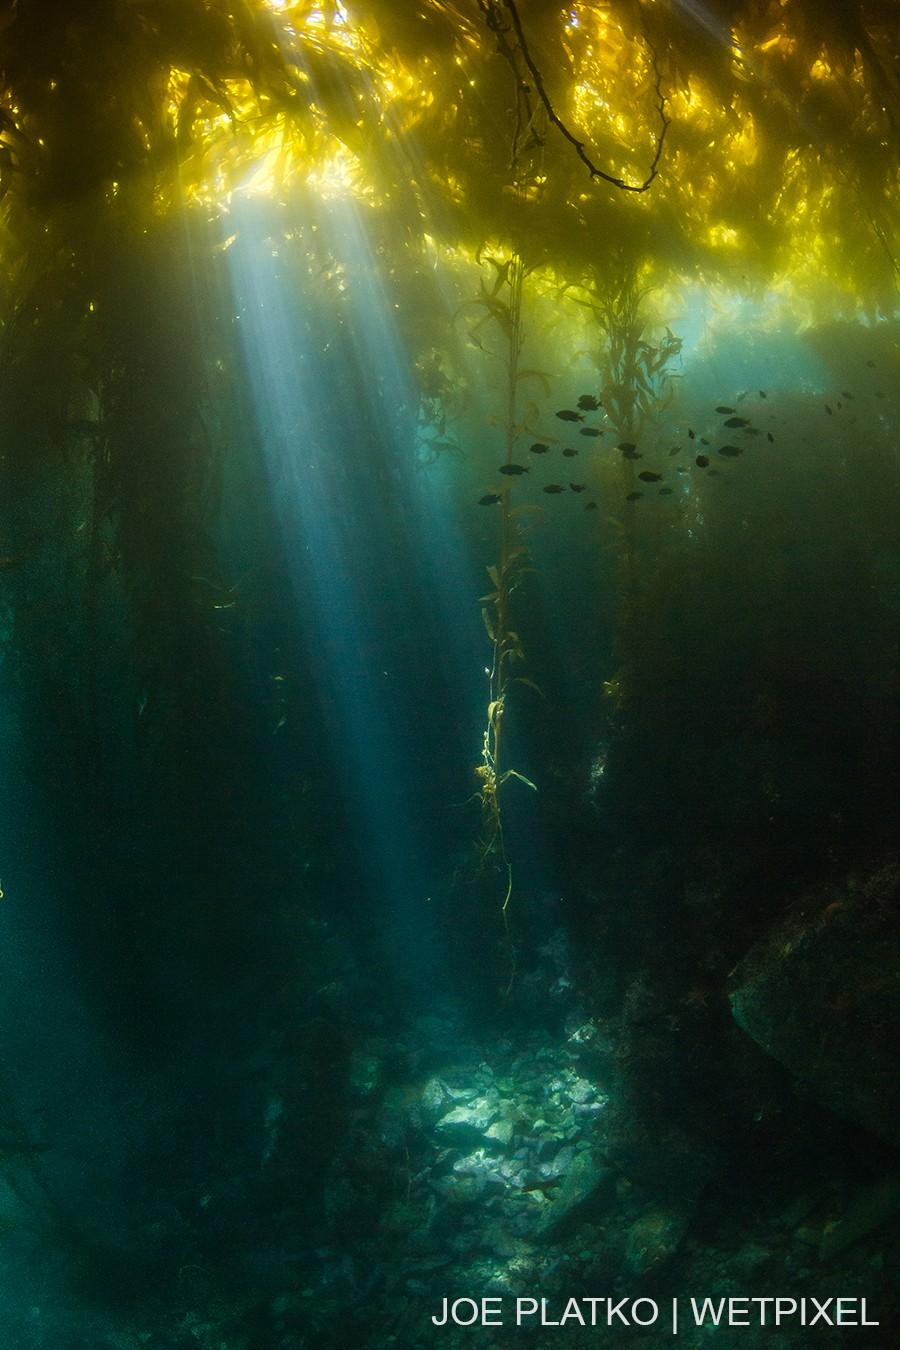 A shaft of light cuts through the kelp canopy, illuminating the rocky floor below.